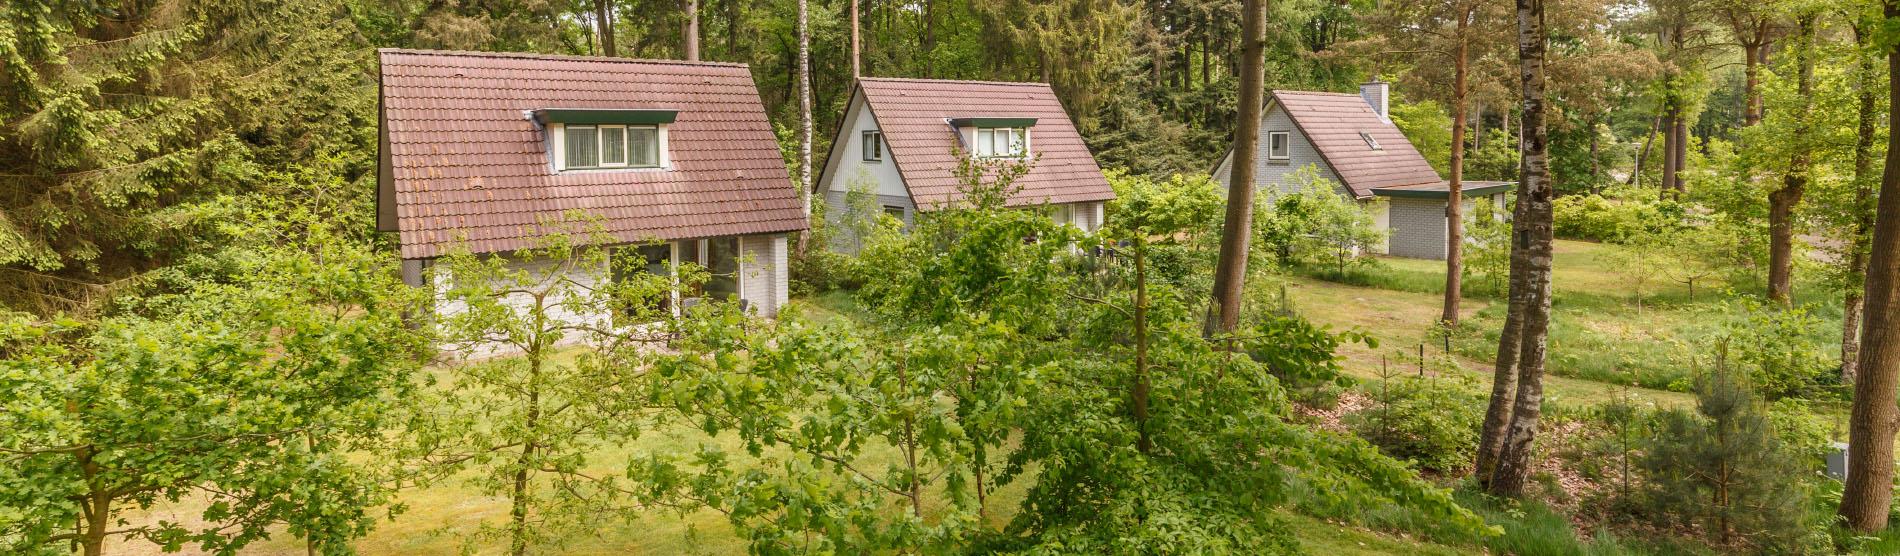 bungalows_veluwe